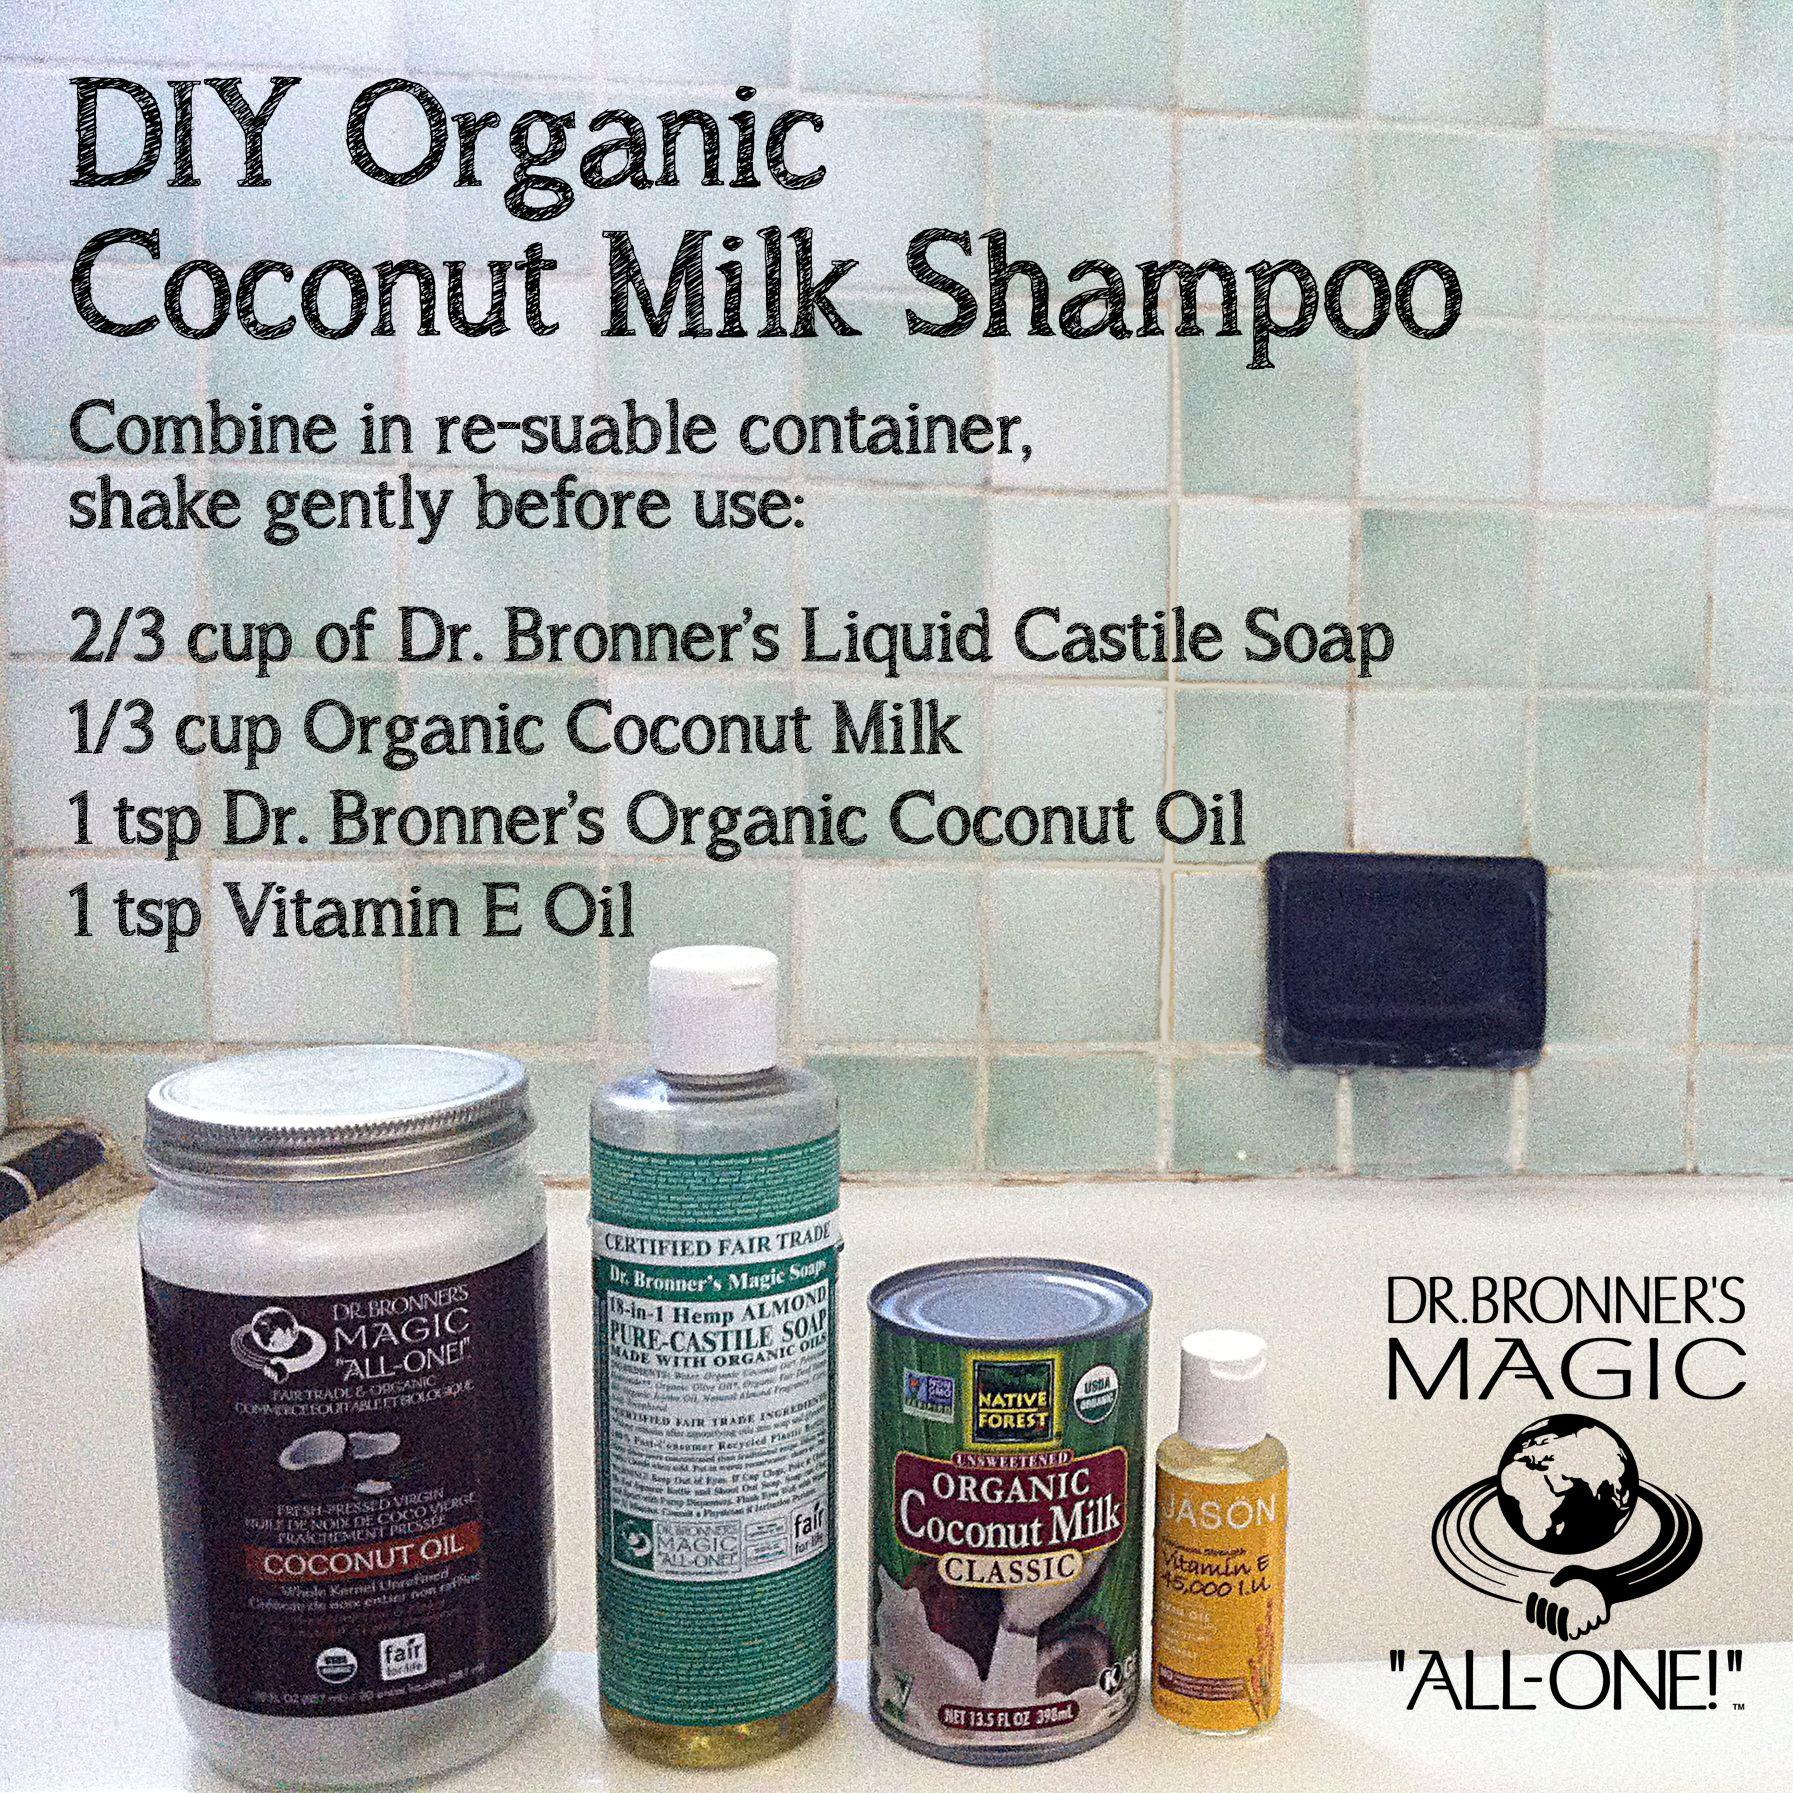 Coconut Milk Shampoo recipe. Details here: http://blog.freepeople.